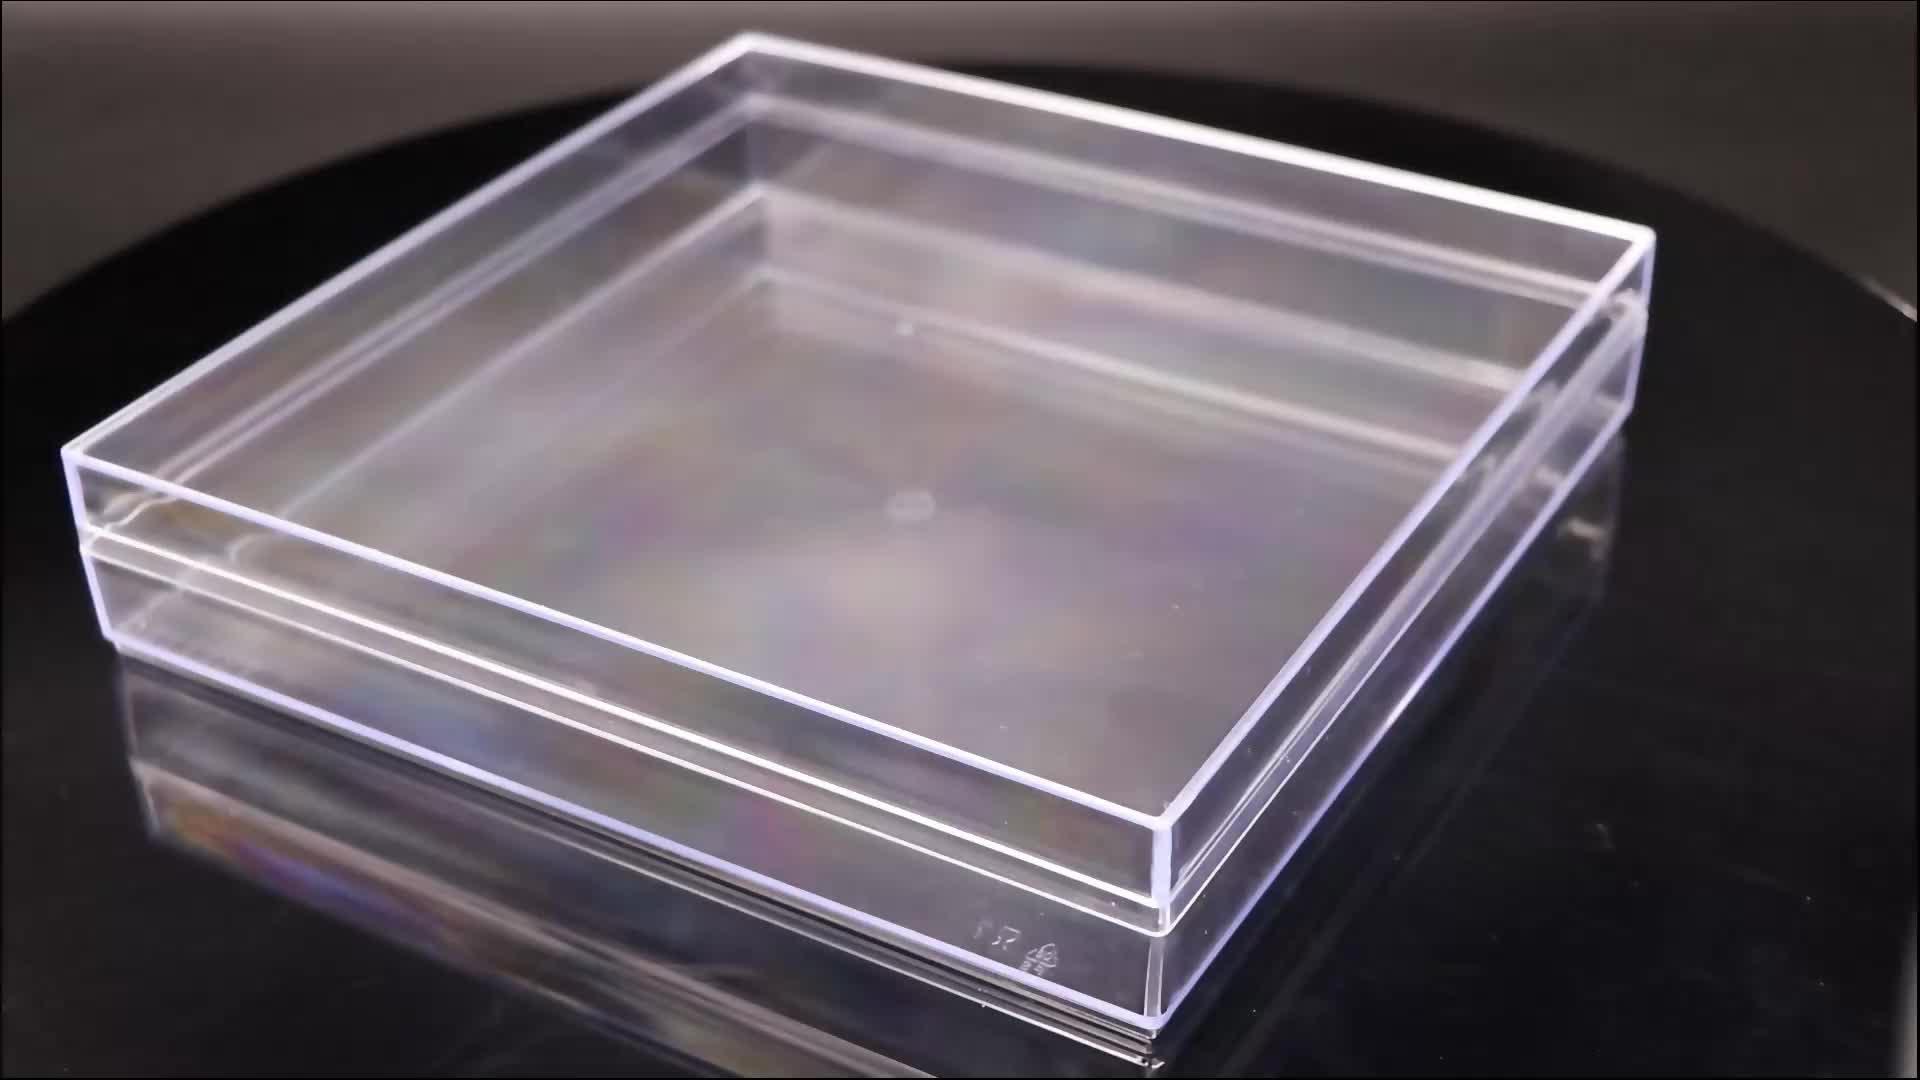 OEM Printingchocolate 선물 상자 스퀘어 식품 용기 플라스틱 럭셔리 초콜릿 초콜릿 투명 상자